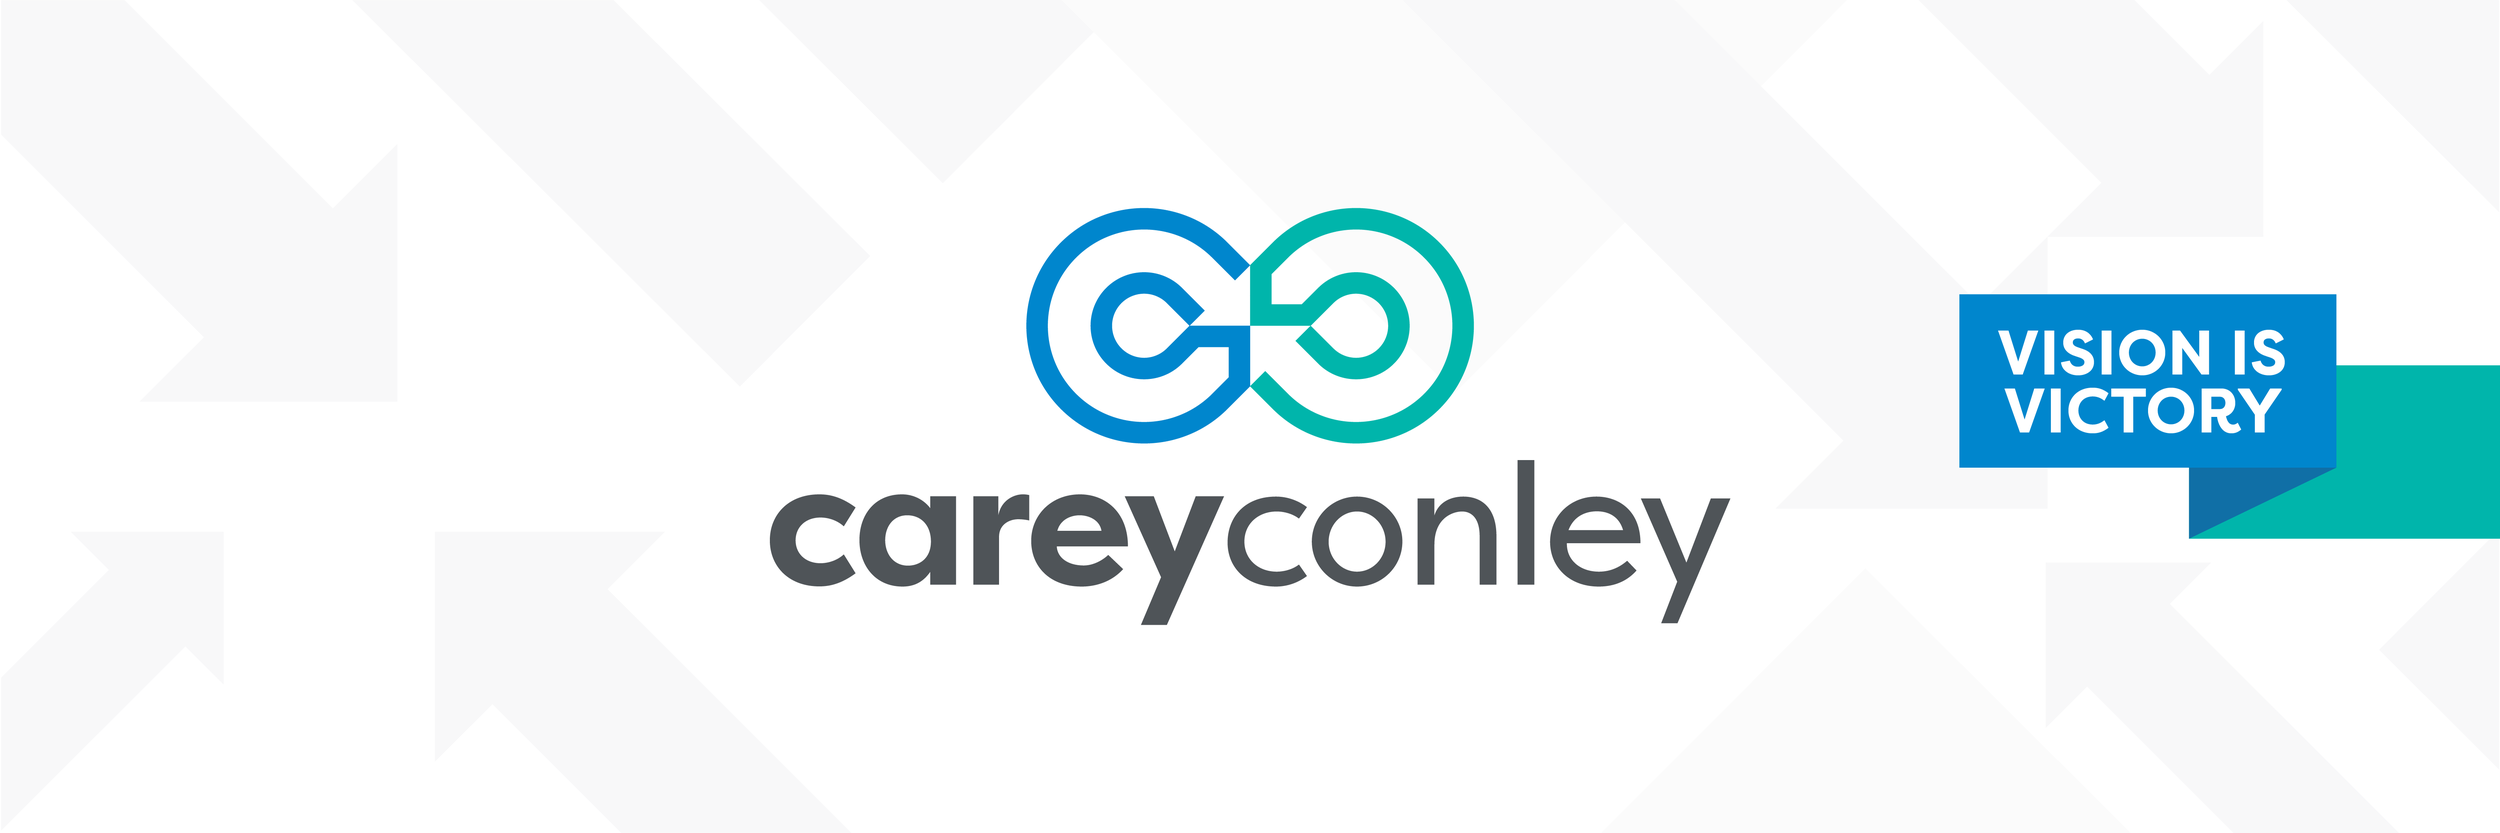 carey-conley-twitter.png